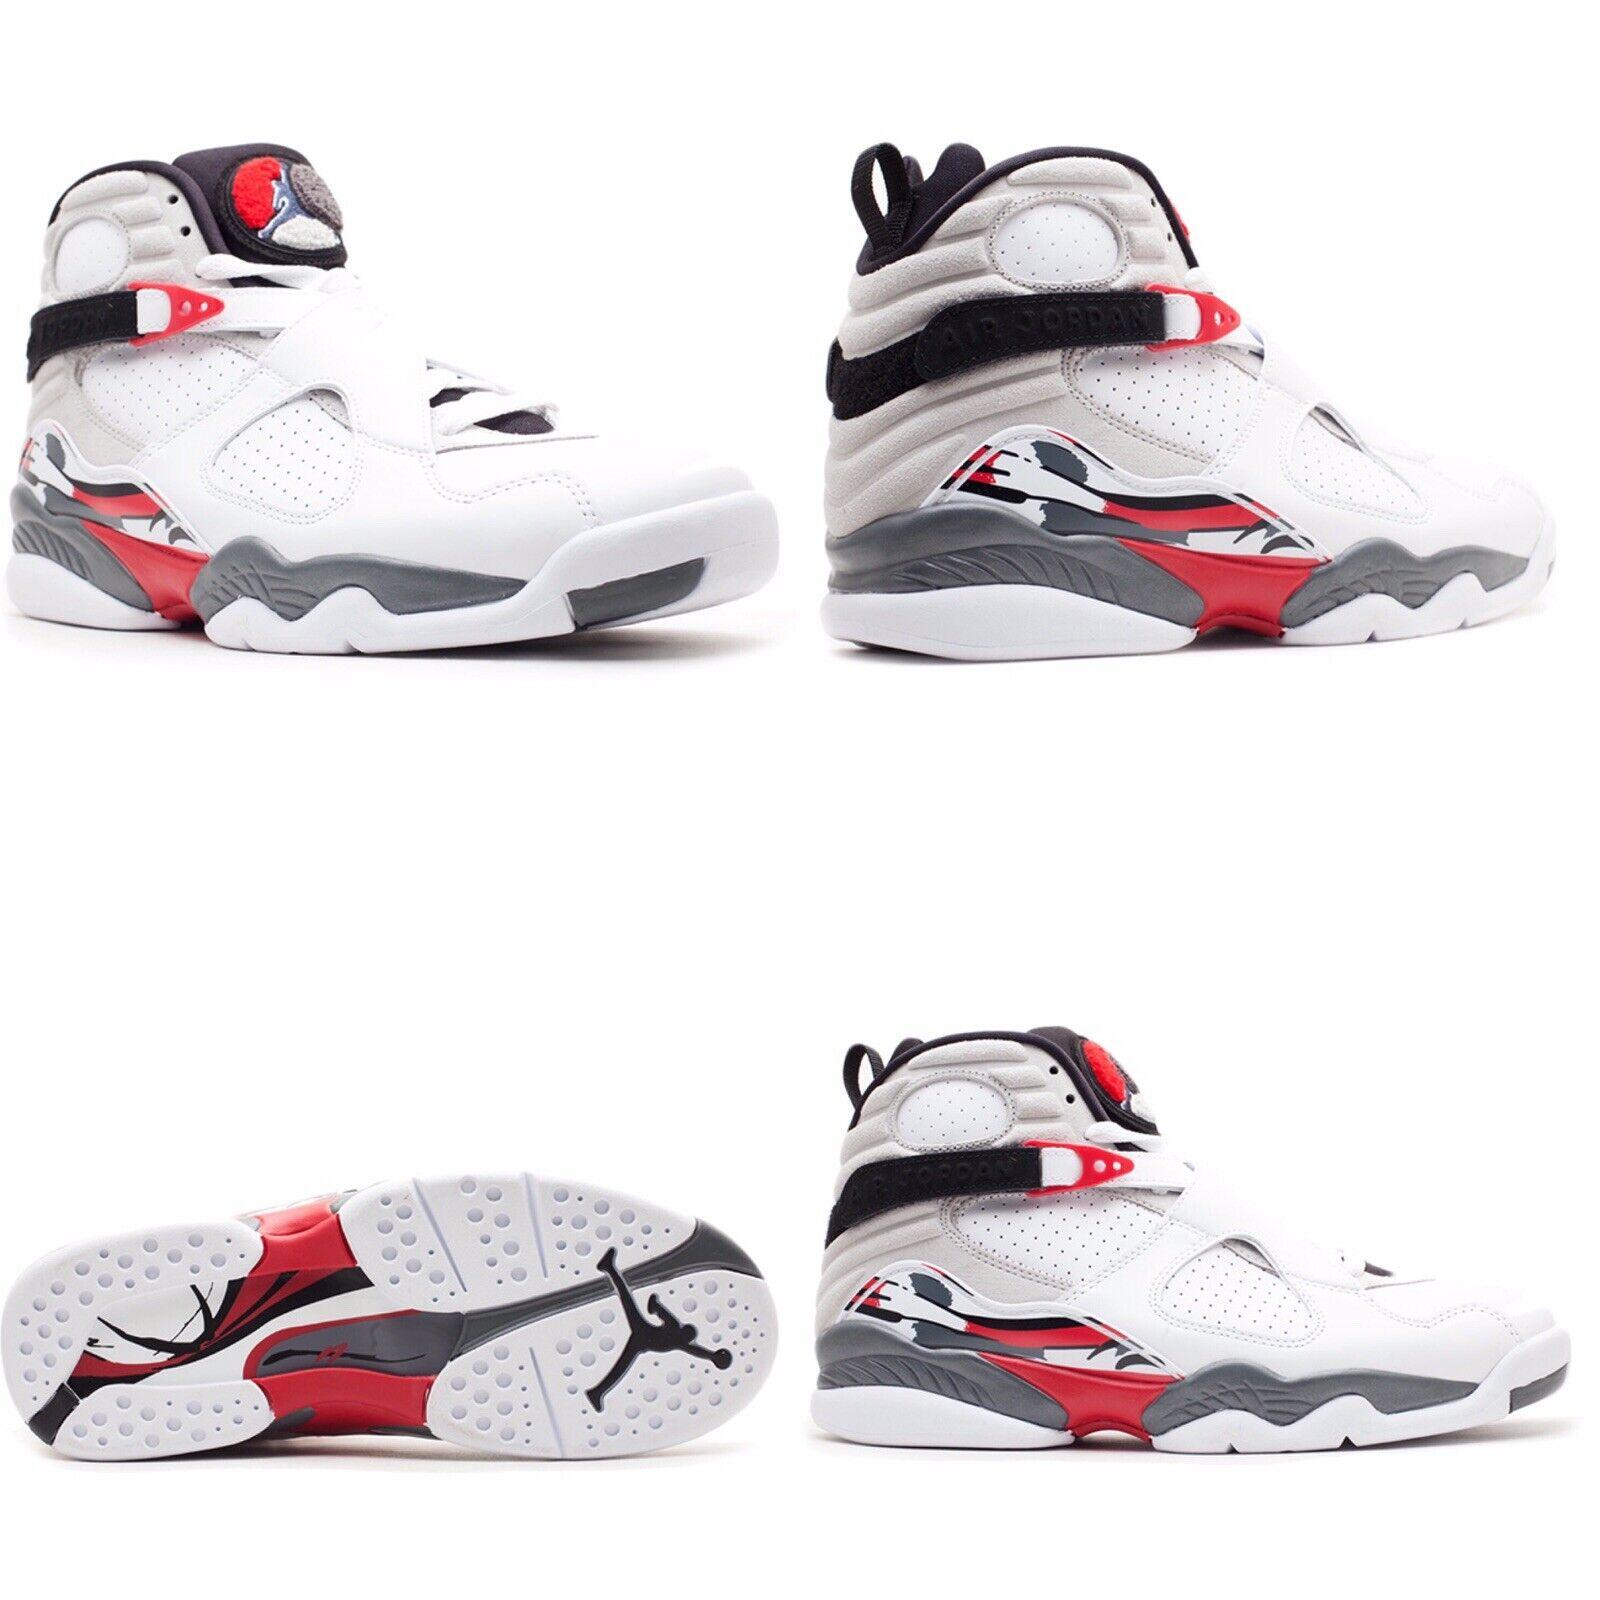 Para hombres JORDAN 8 RETRO Bugs Bunny AIR blancoo Negro Rojo 305381-103, tamaño 14